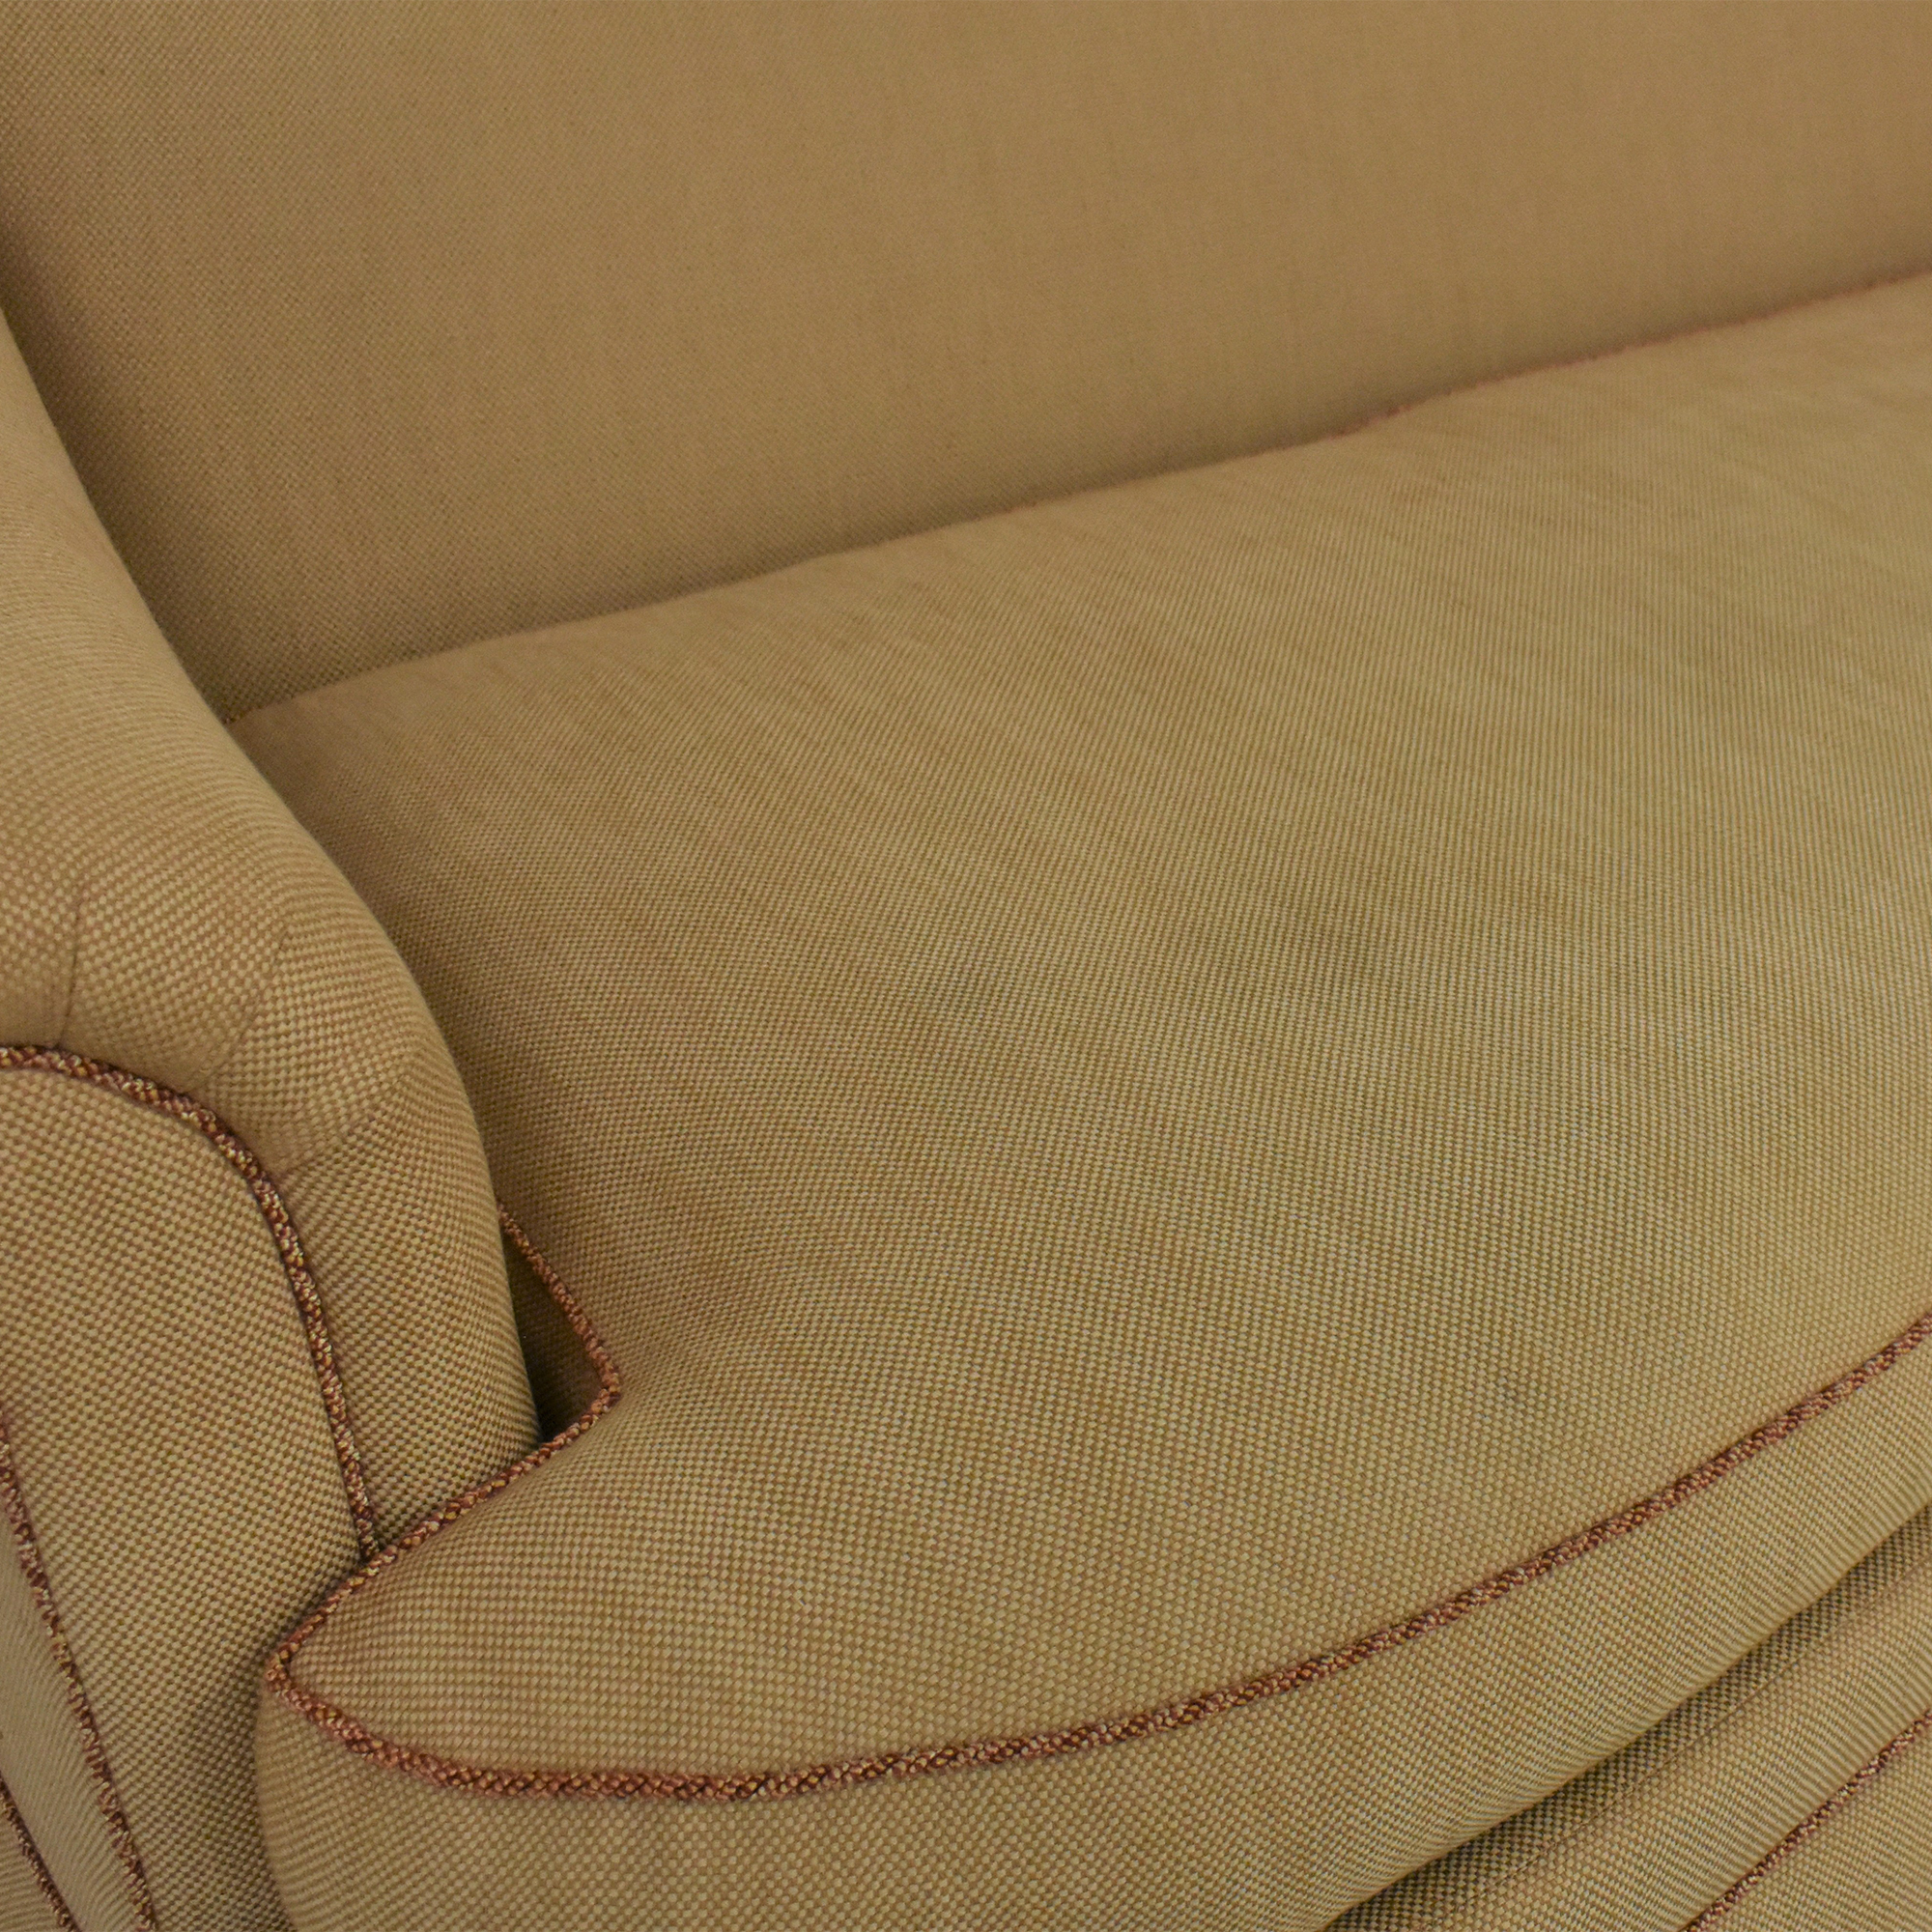 Ethan Allen Ethan Allen Roll Arm Skirted Sofa